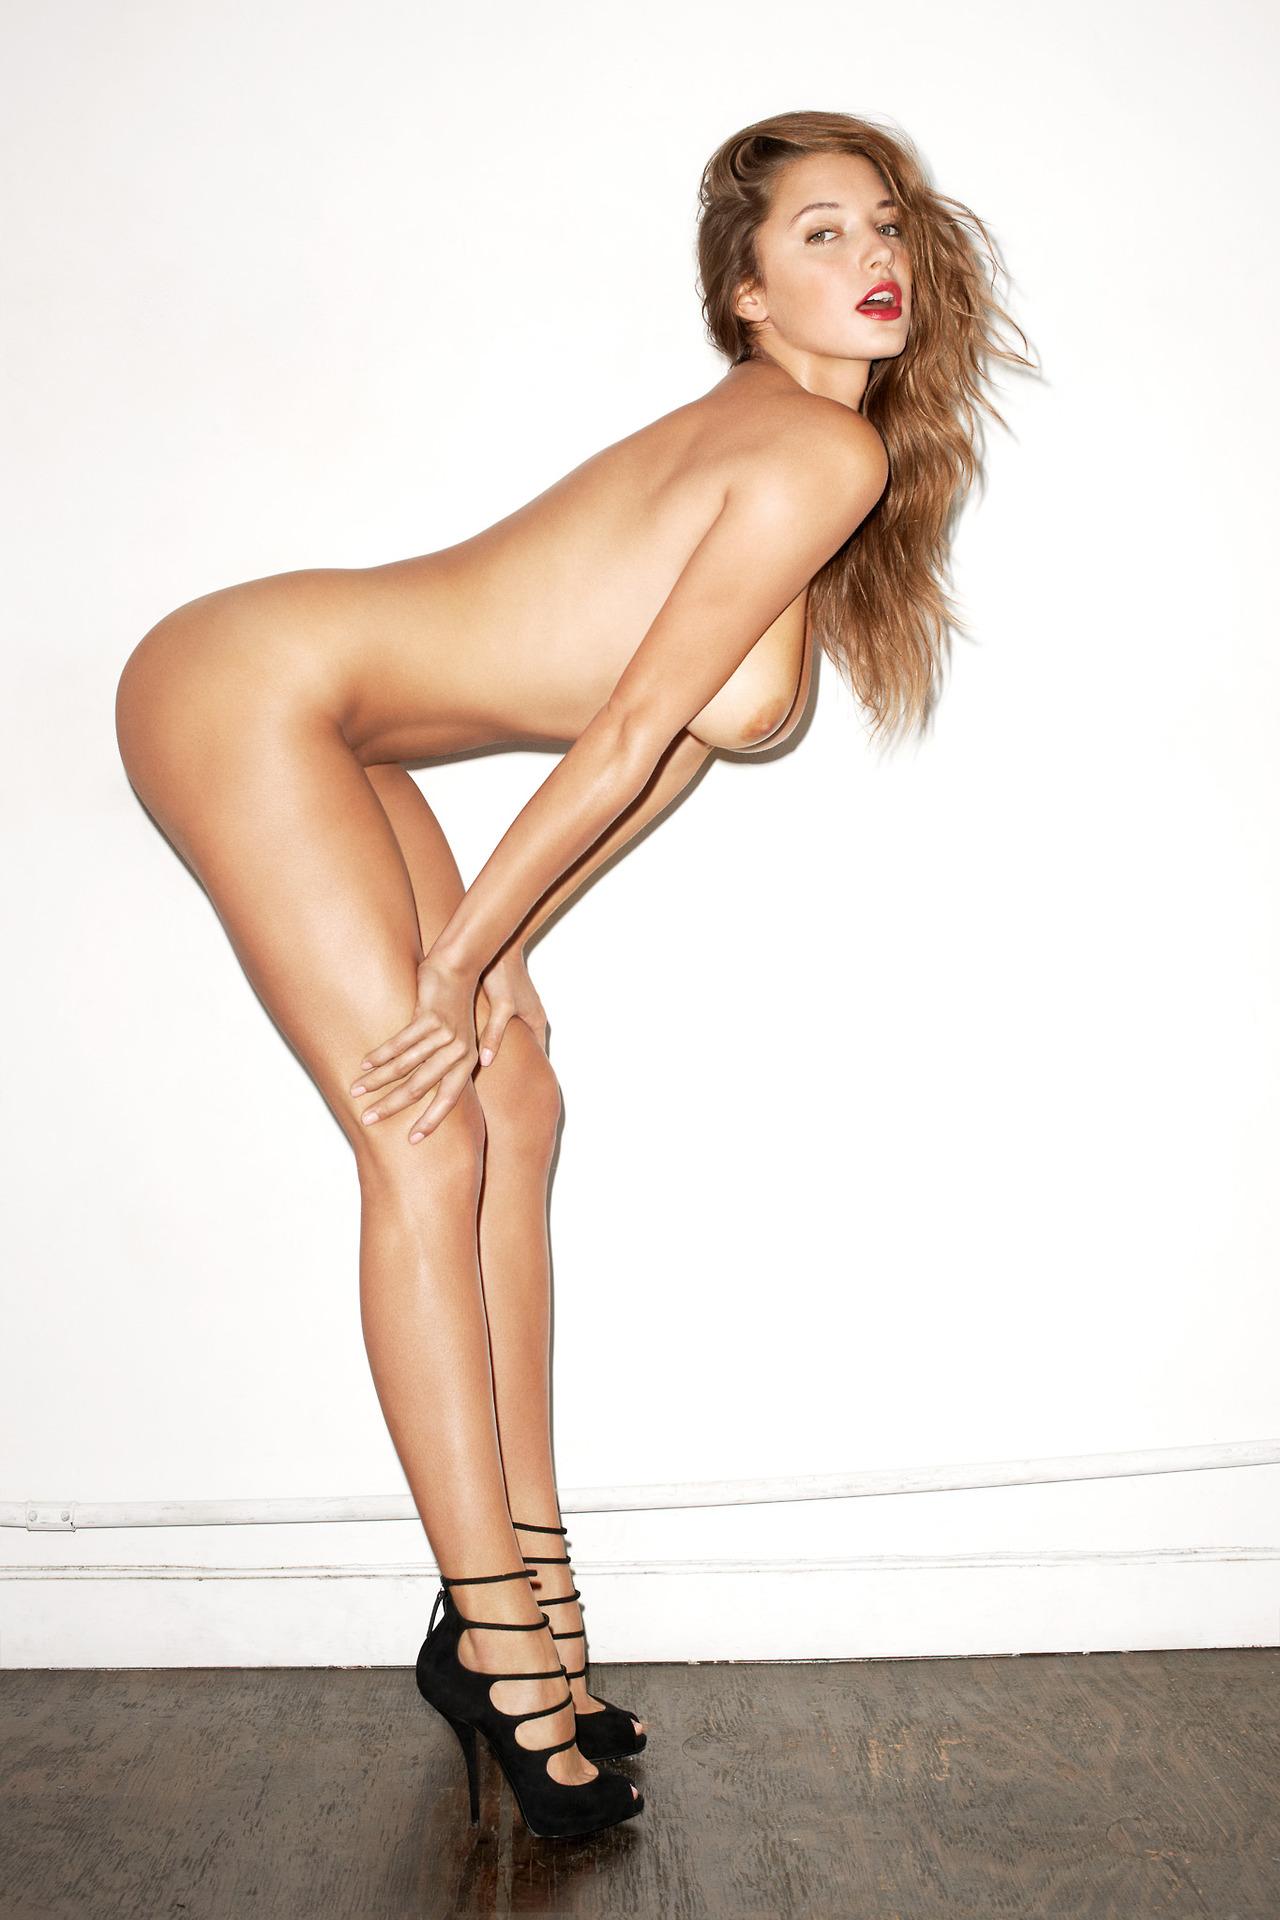 Alyssa Arce Terry Richardson Babes Today